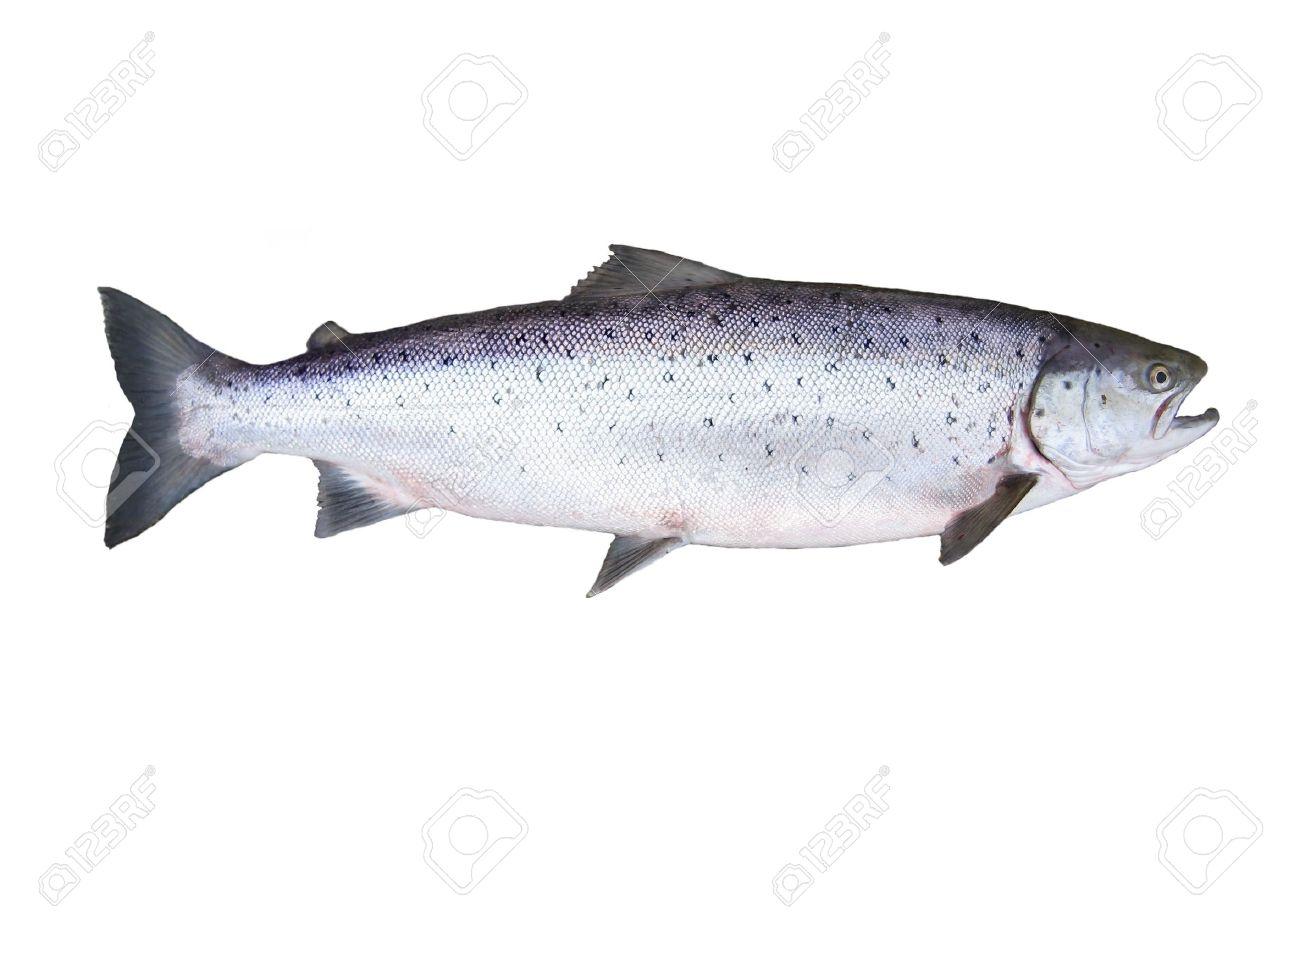 photo of fish salmon on white background Stock Photo - 5513071